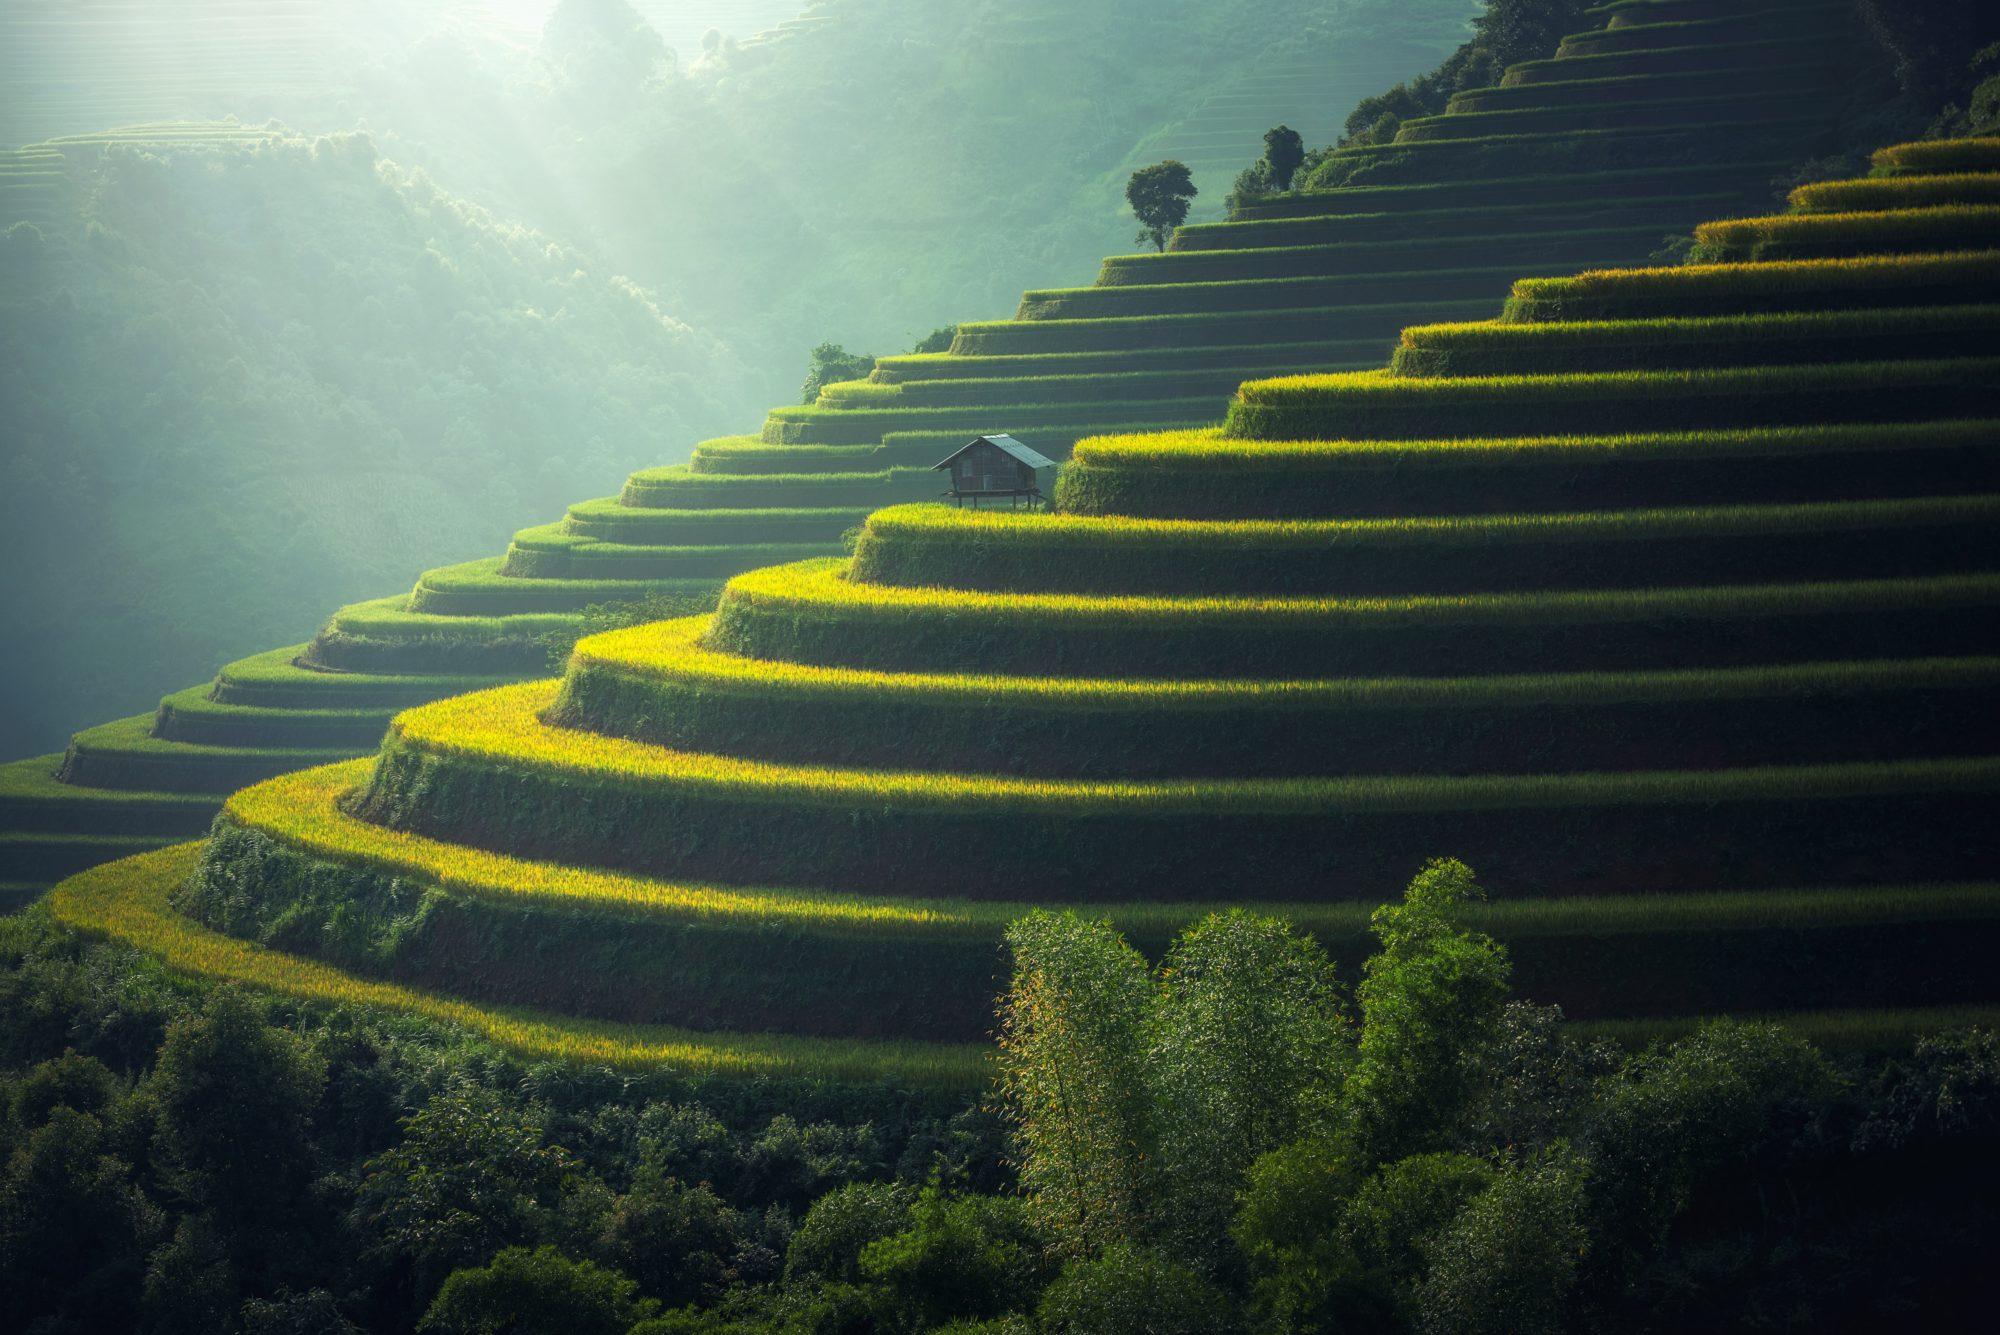 rice paddy scenic landscape photography